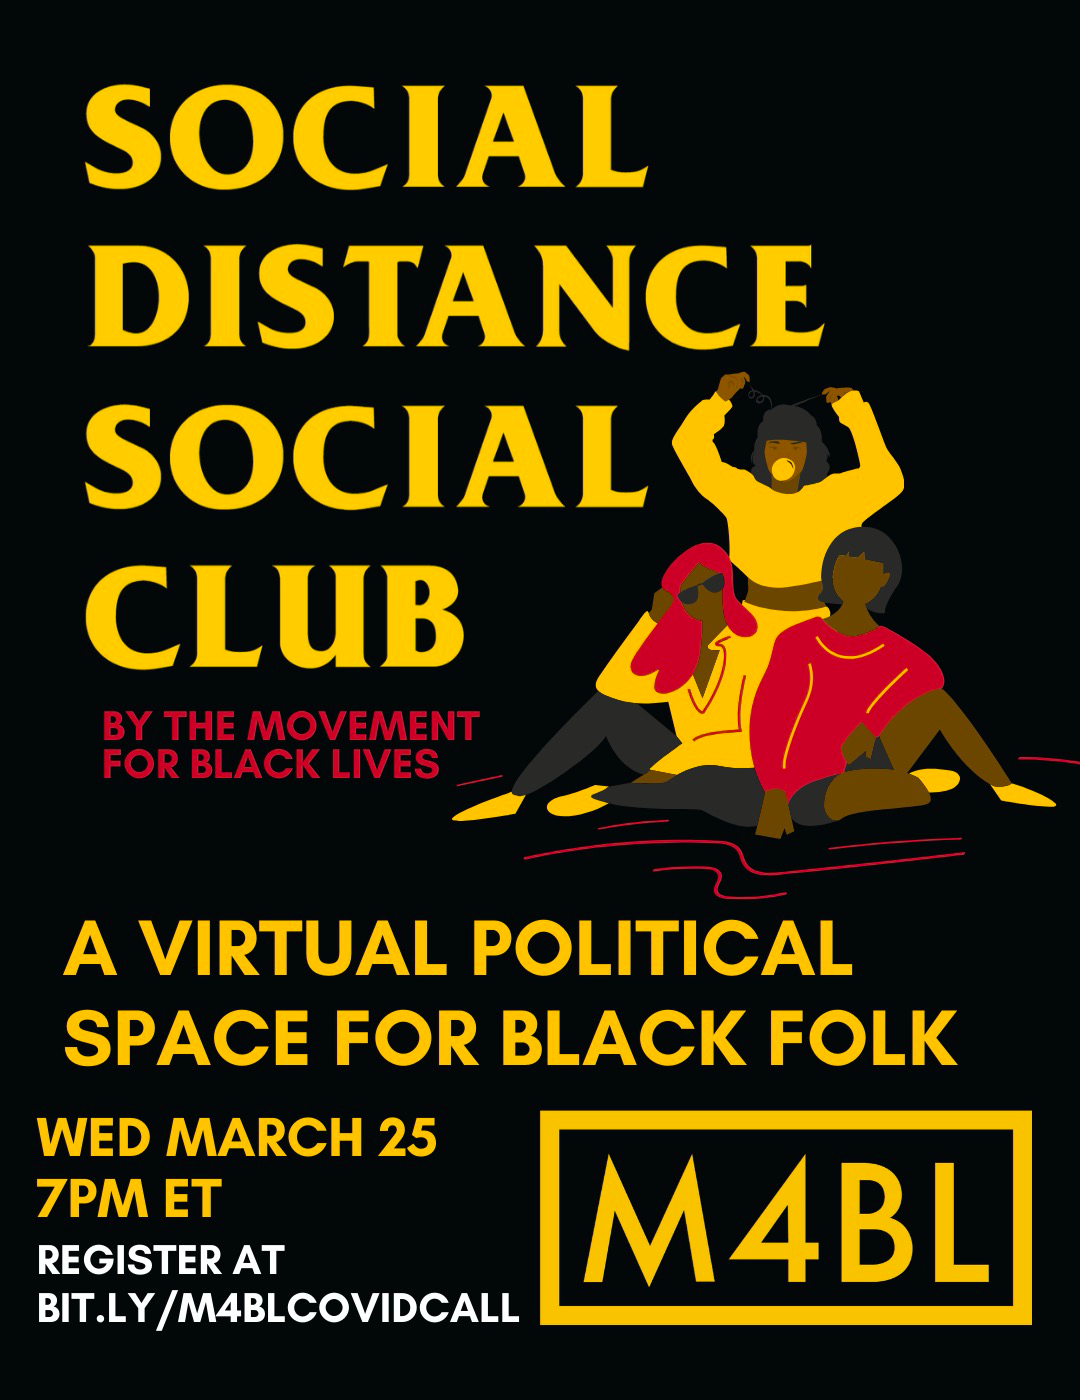 Social Distance Social Club: A Virtual Political Space for Black Folk event poster